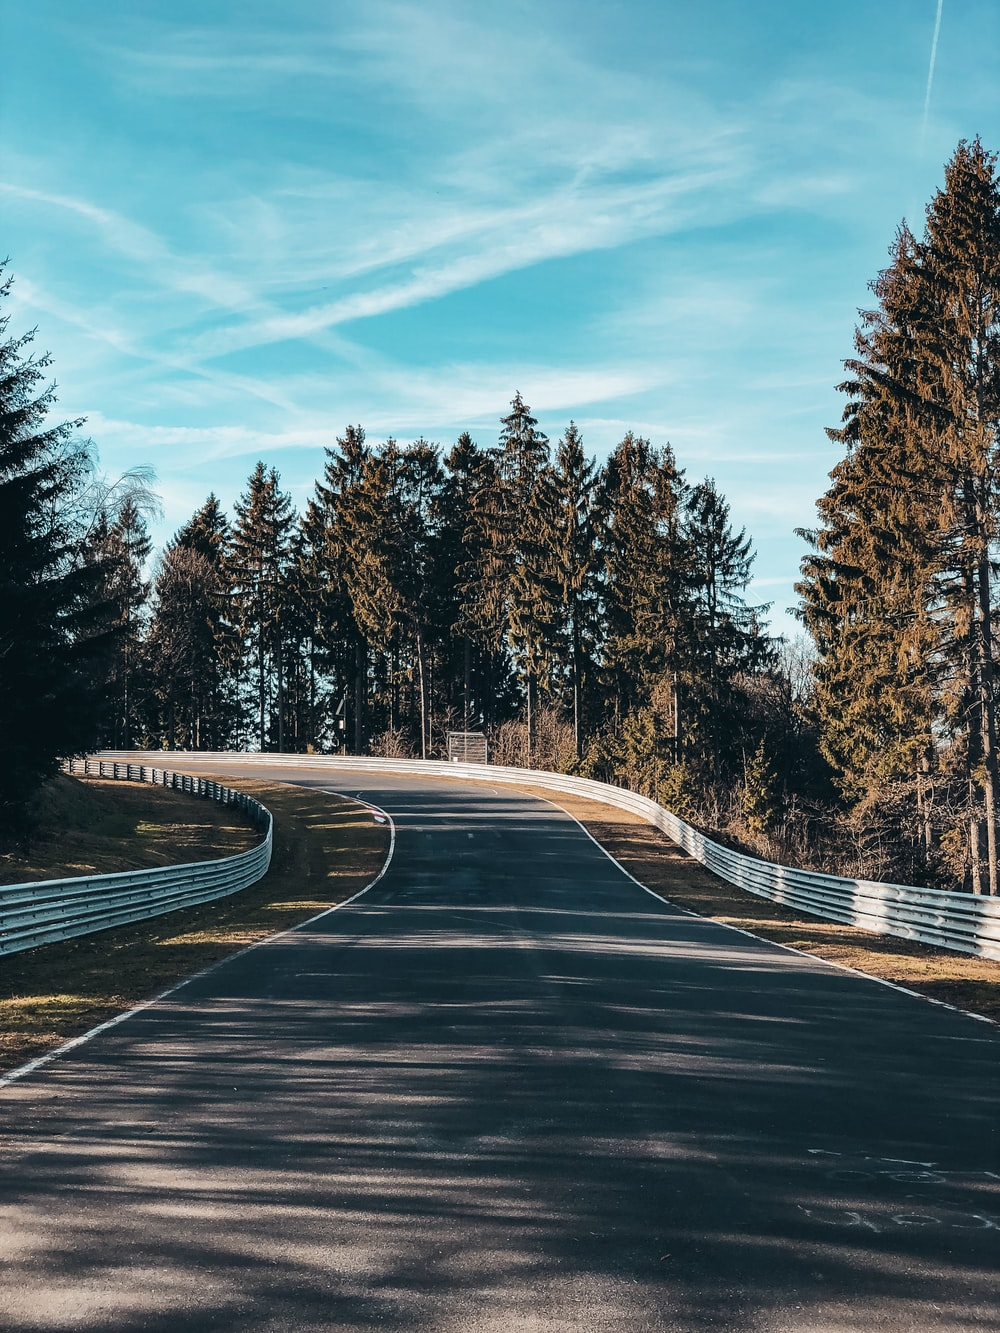 empty roadway under blue sky